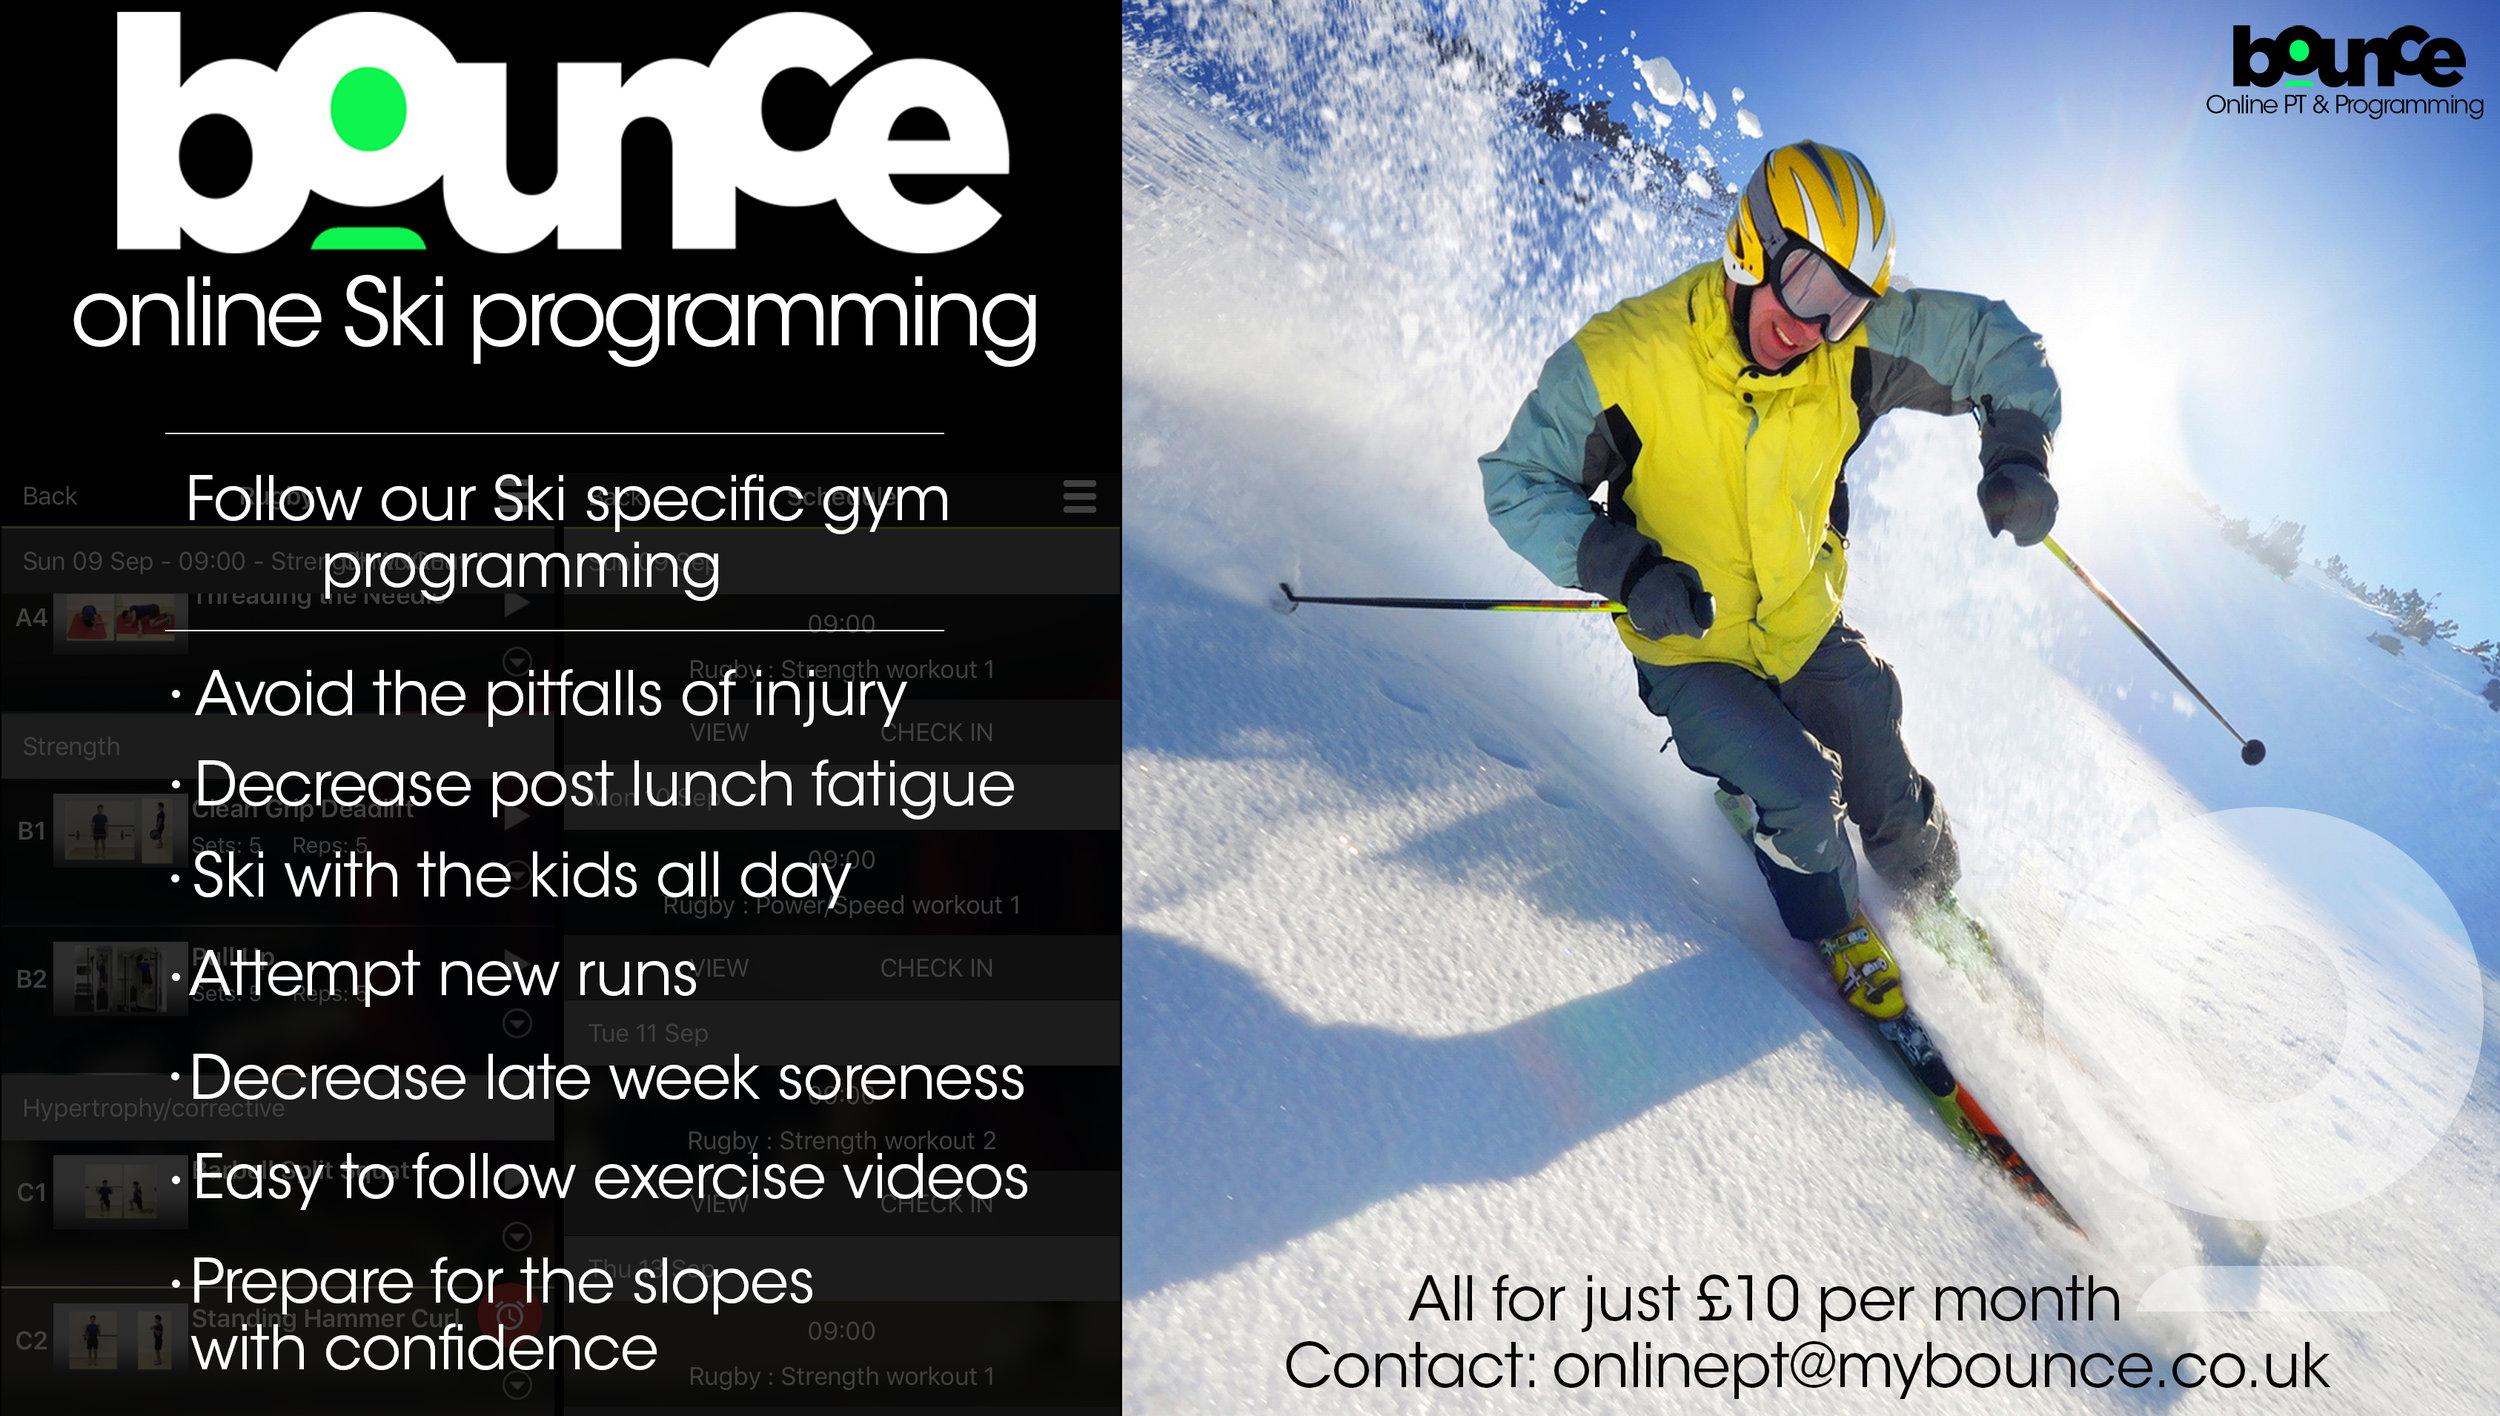 online ski programming ad.jpg